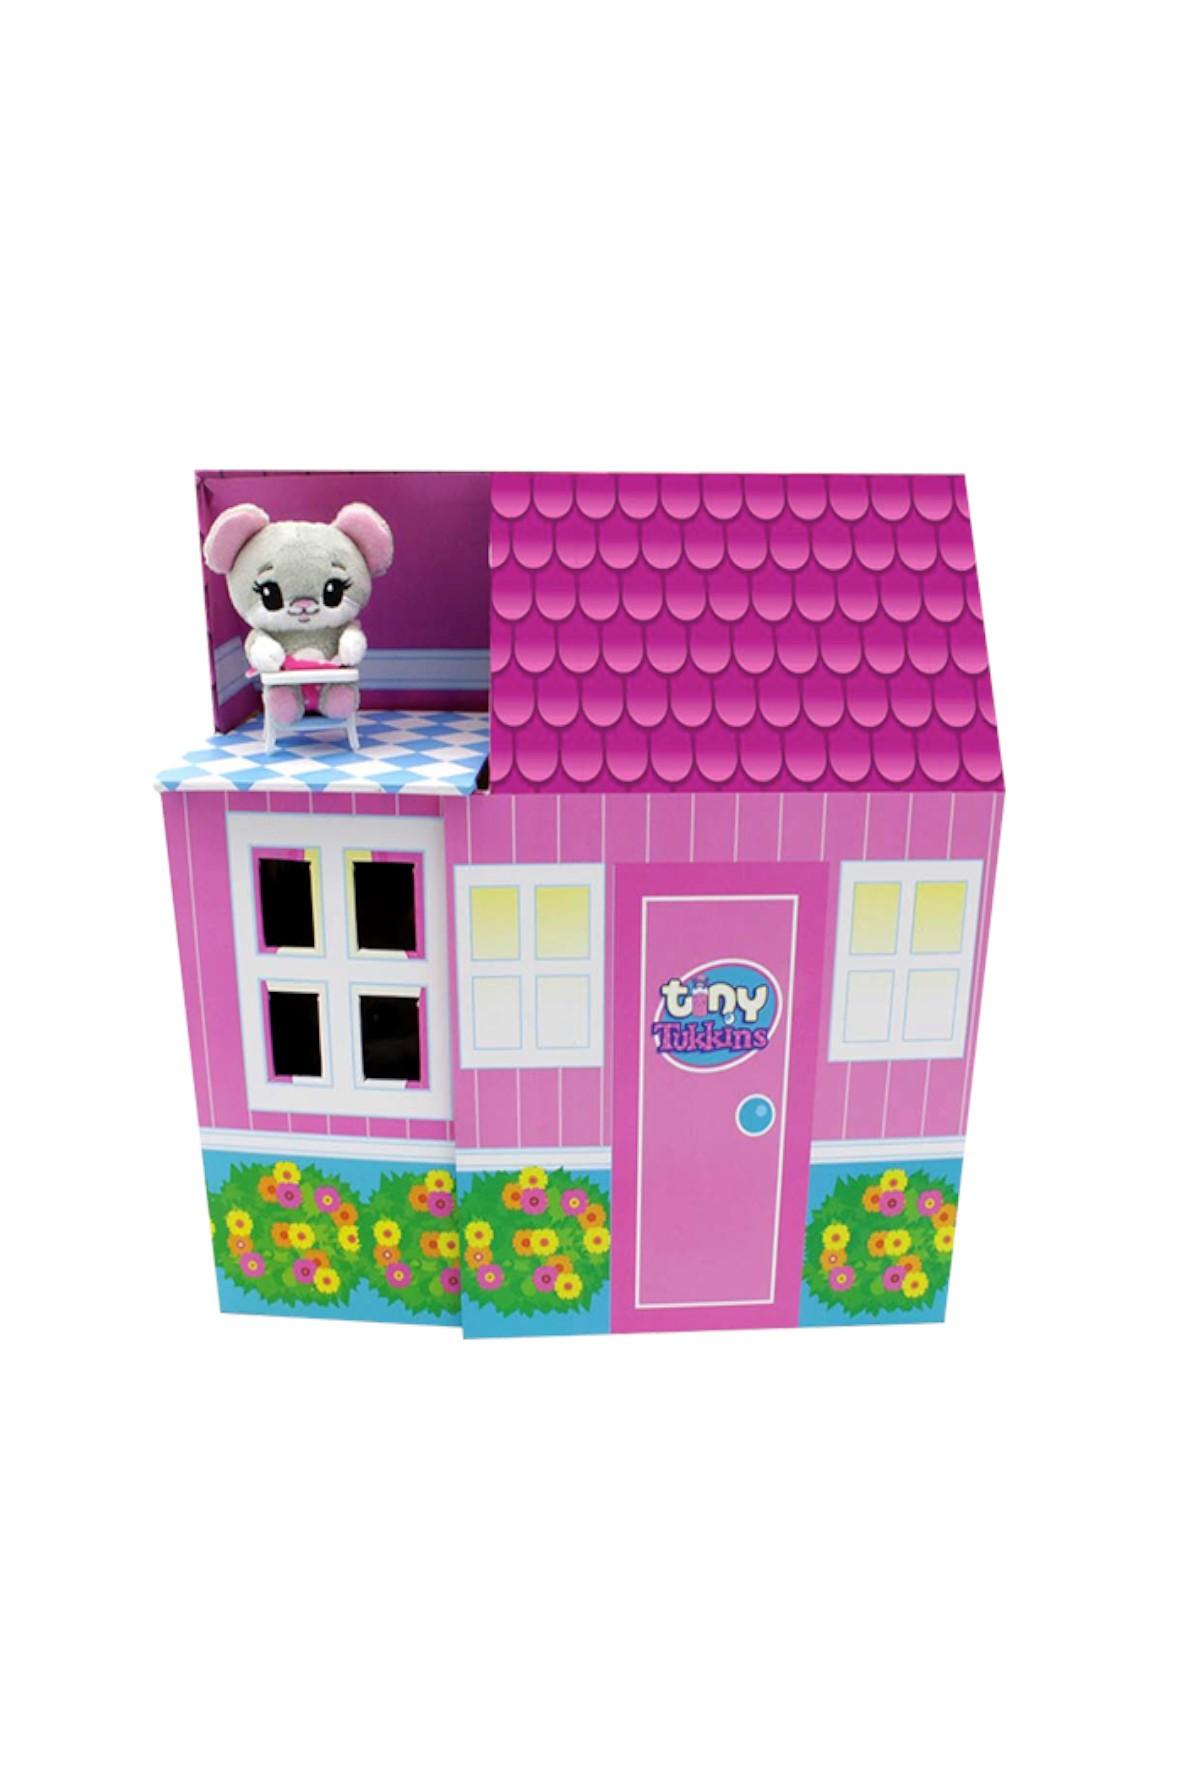 Tiny Tukkins - Domek Delux wiek 3+